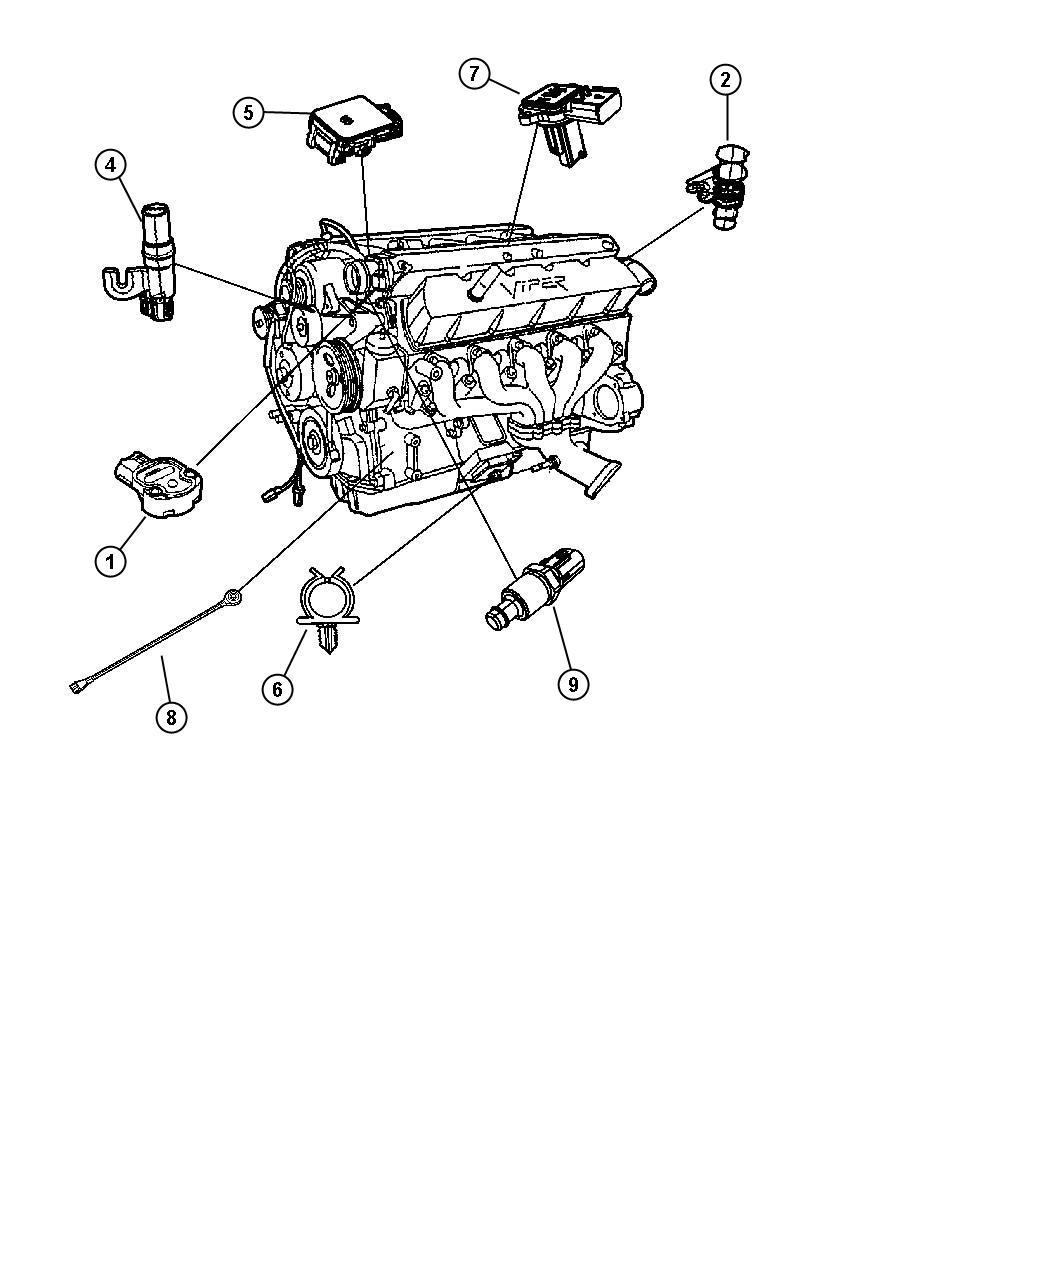 2010 Dodge Viper Sensor. Mass airflow. Engine, sensors